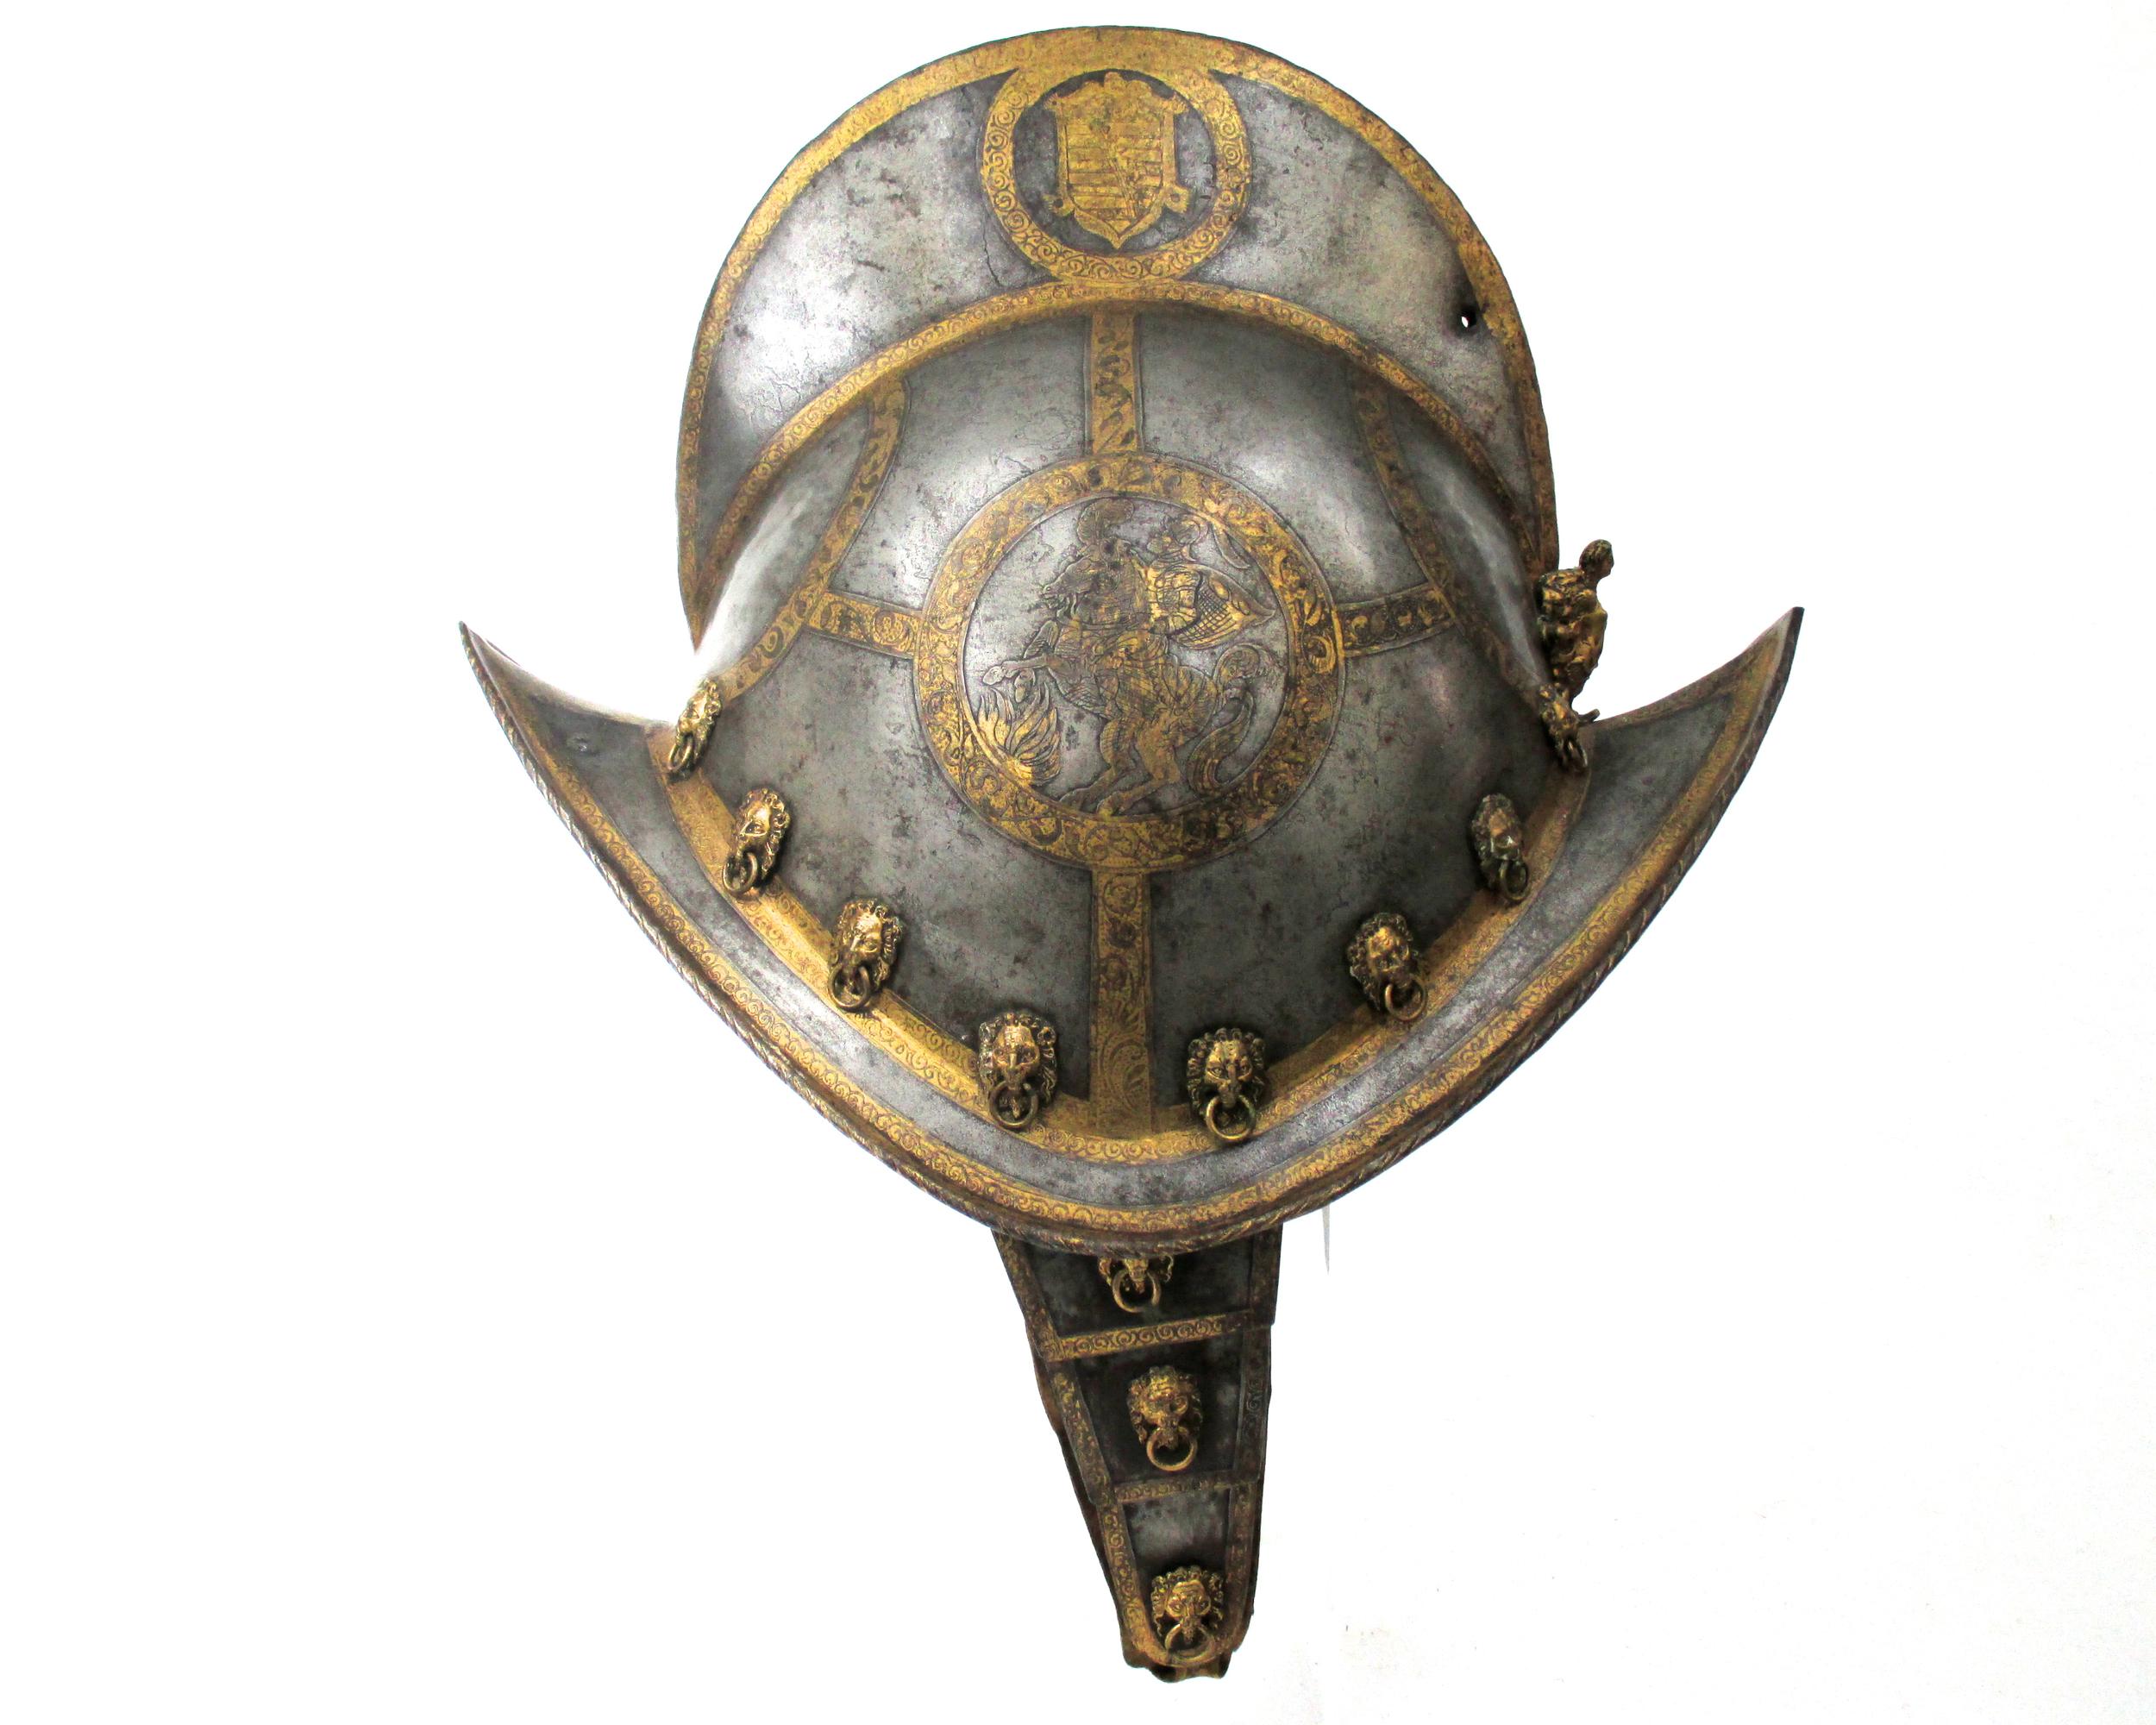 saxon-electoral-guard-comb-morion-late16th-century-helmet-nuremburg-german-gary-friedland-arms-armor1.jpg